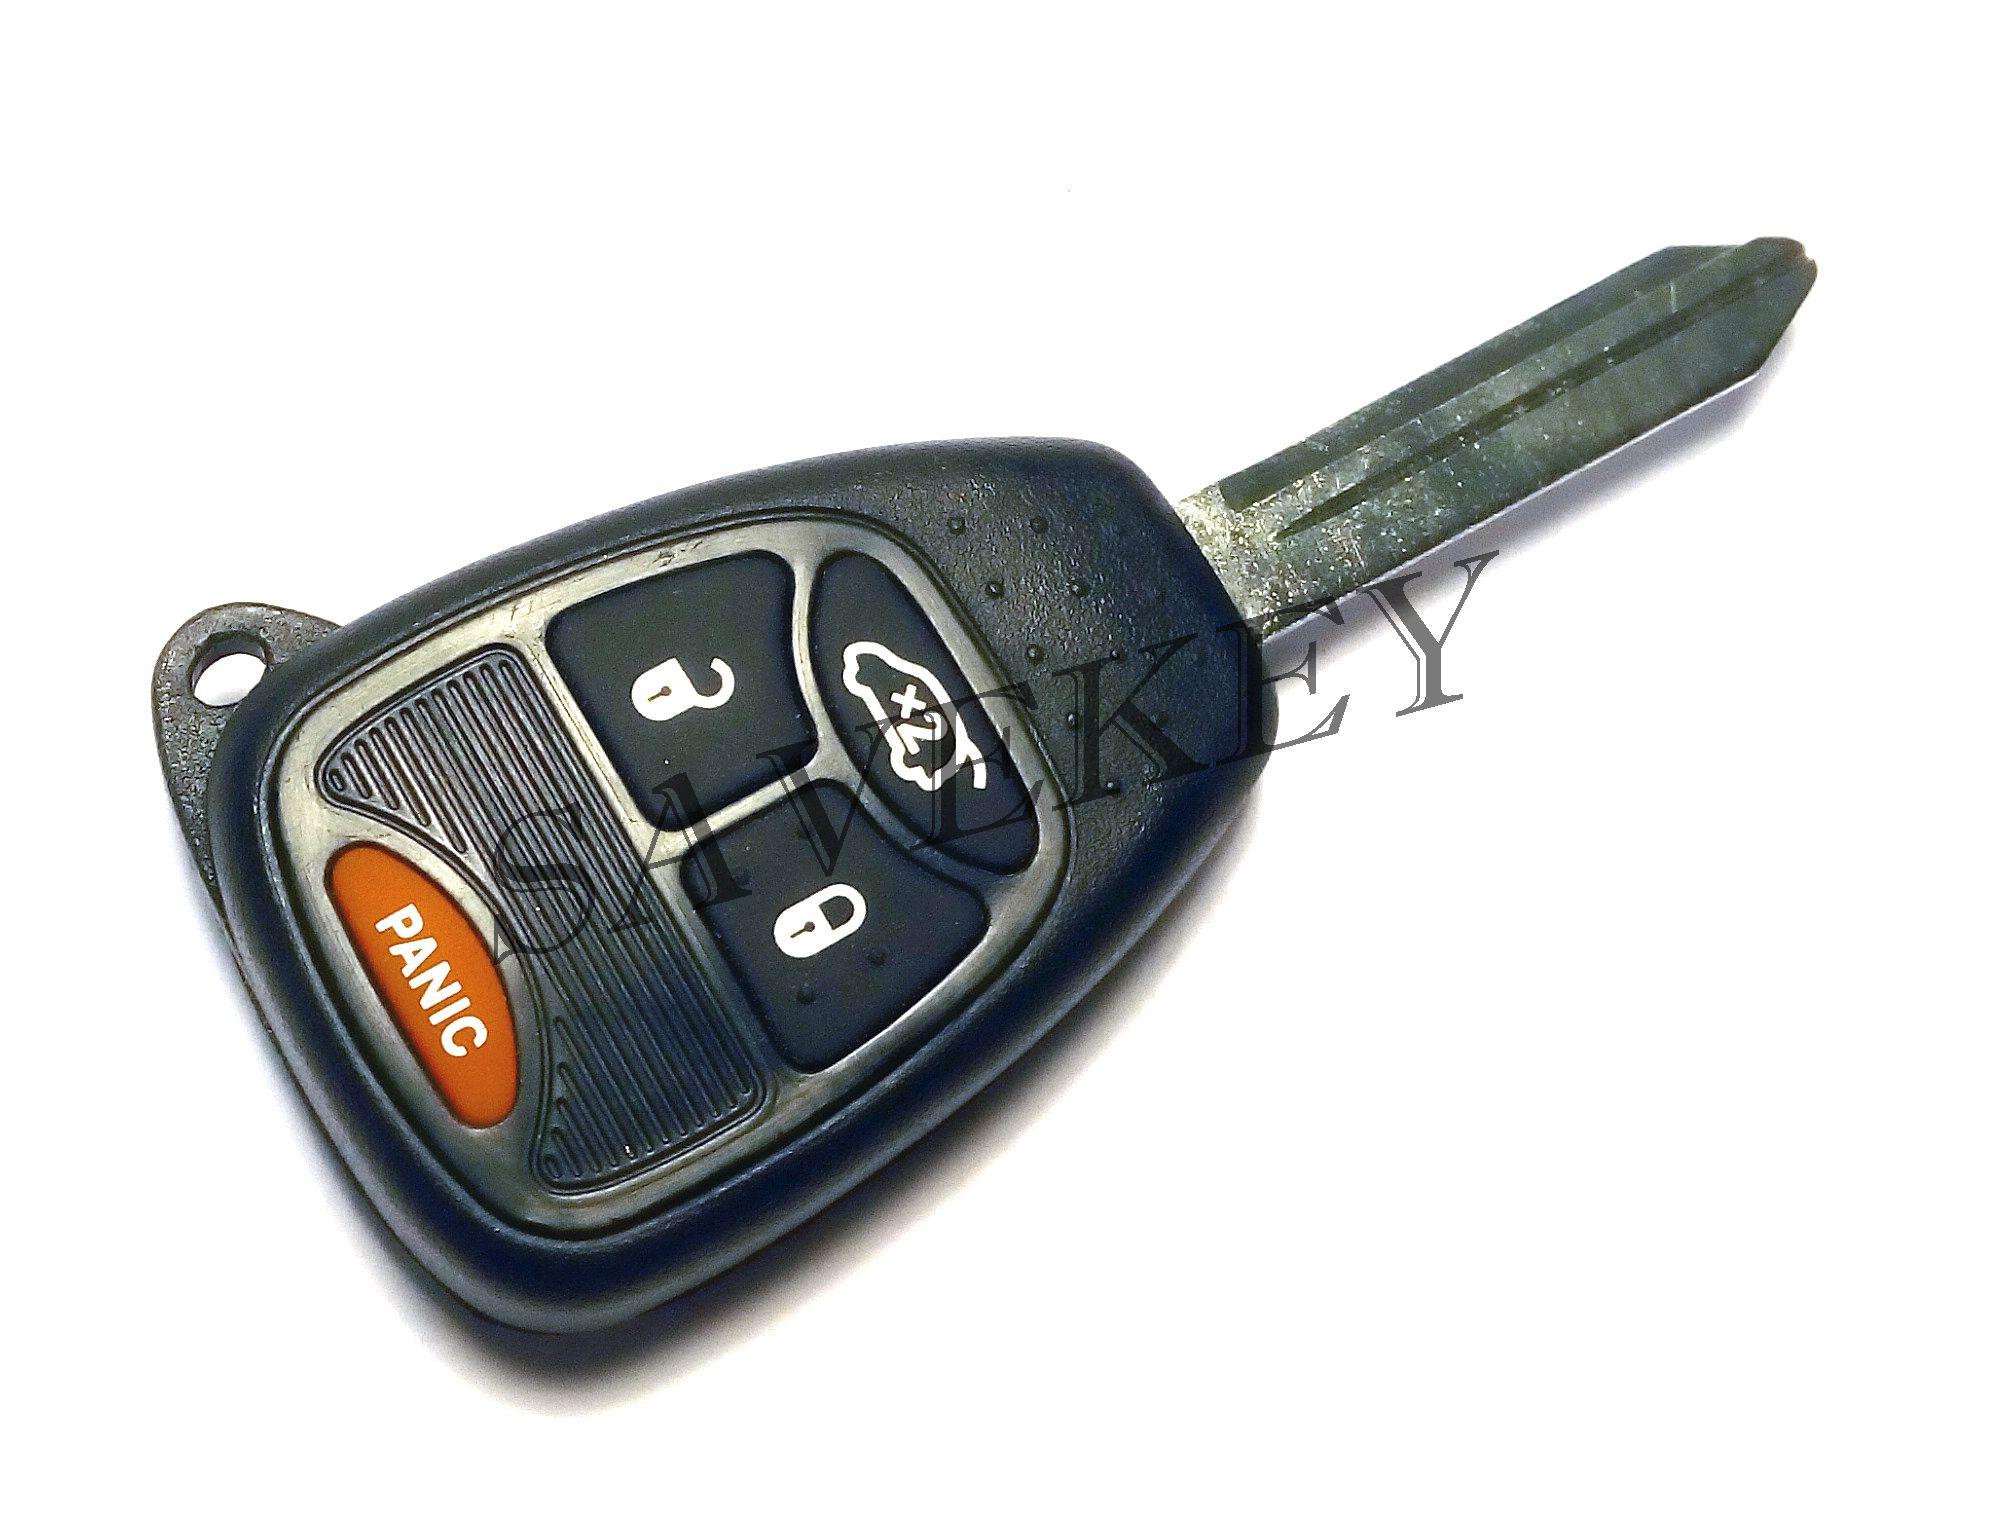 Дистанционный ключ Jeep для моделей PACIFICA, LIBERTY, COMPASS, CHEROKEE, LIBERTY, WRANGLER 4 кнопки 433 Mhz